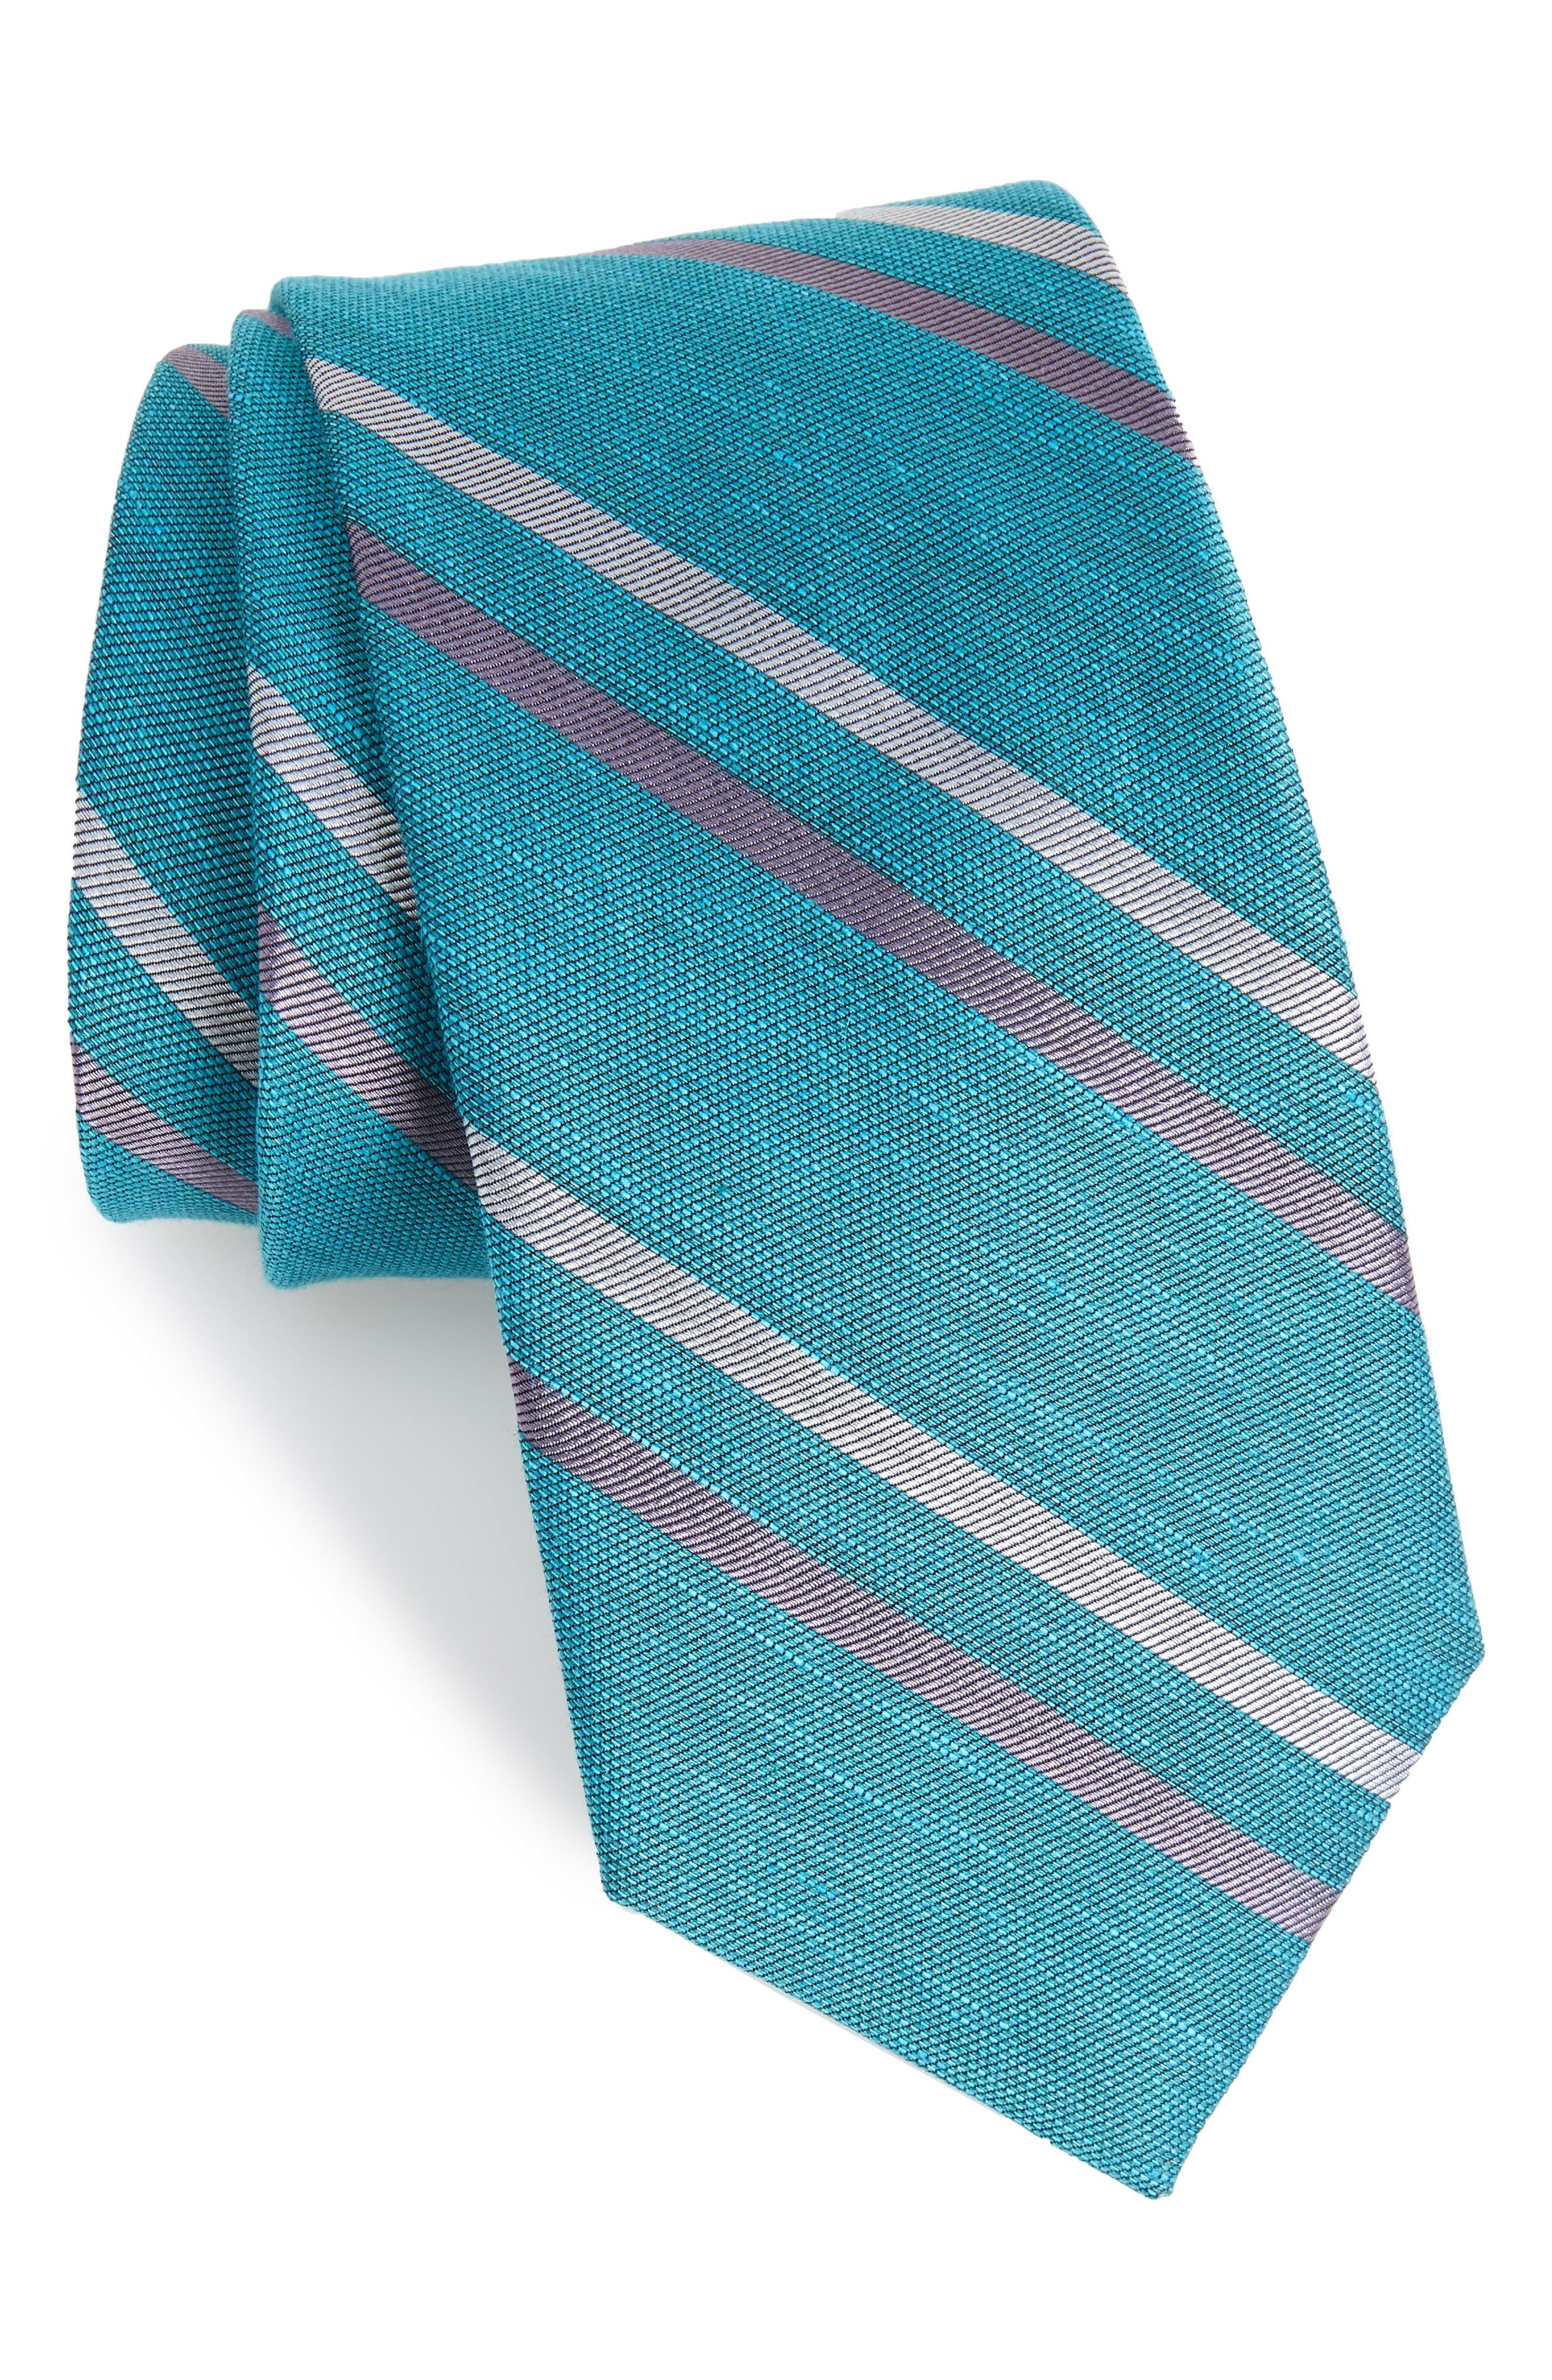 Pep Stripe Tie,                         Main,                         color, AQUA